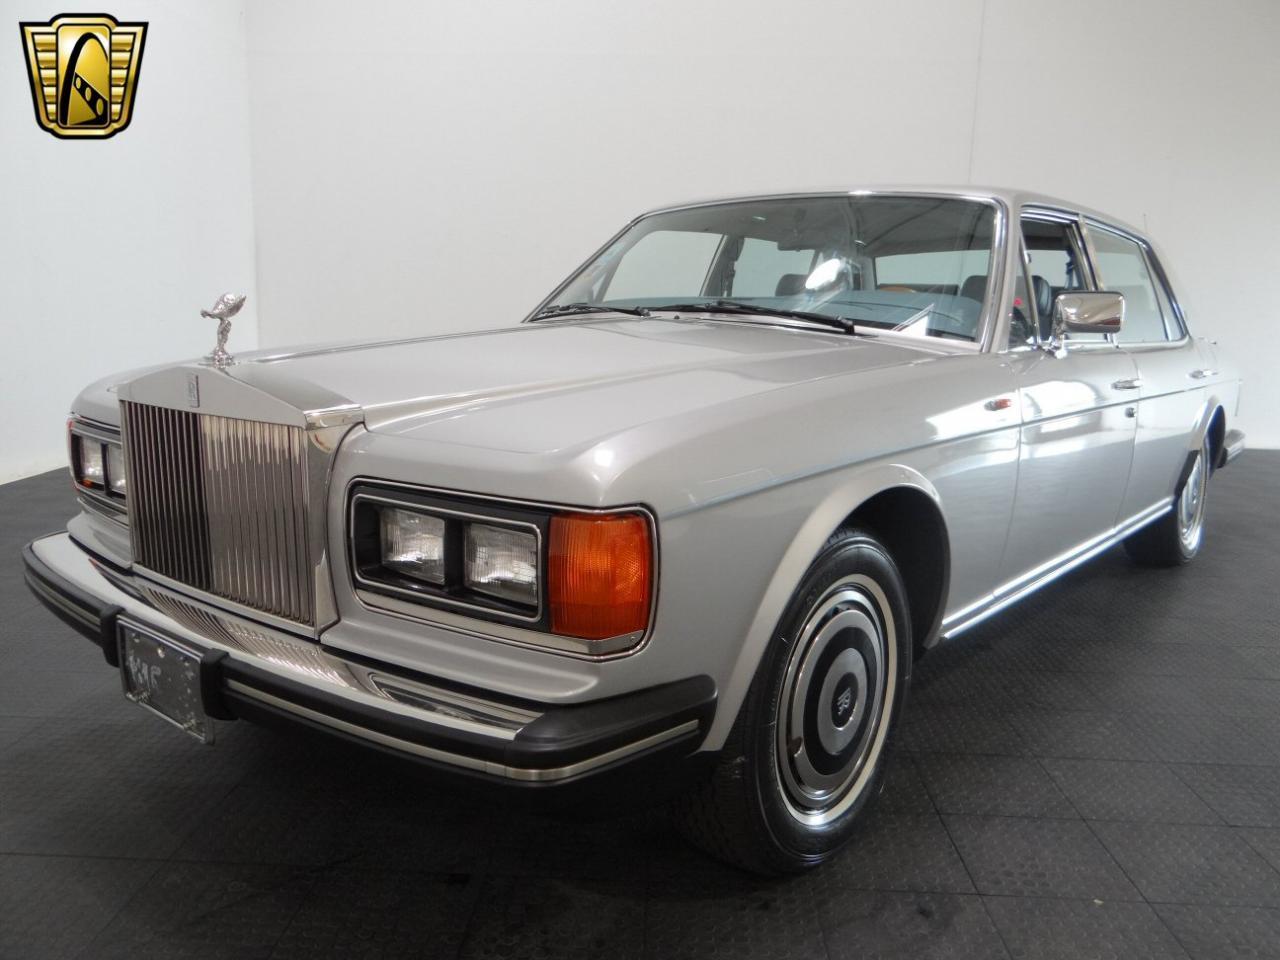 1986 Rolls Royce Silver Spur 43838 Miles Silver Sedan 6 8l